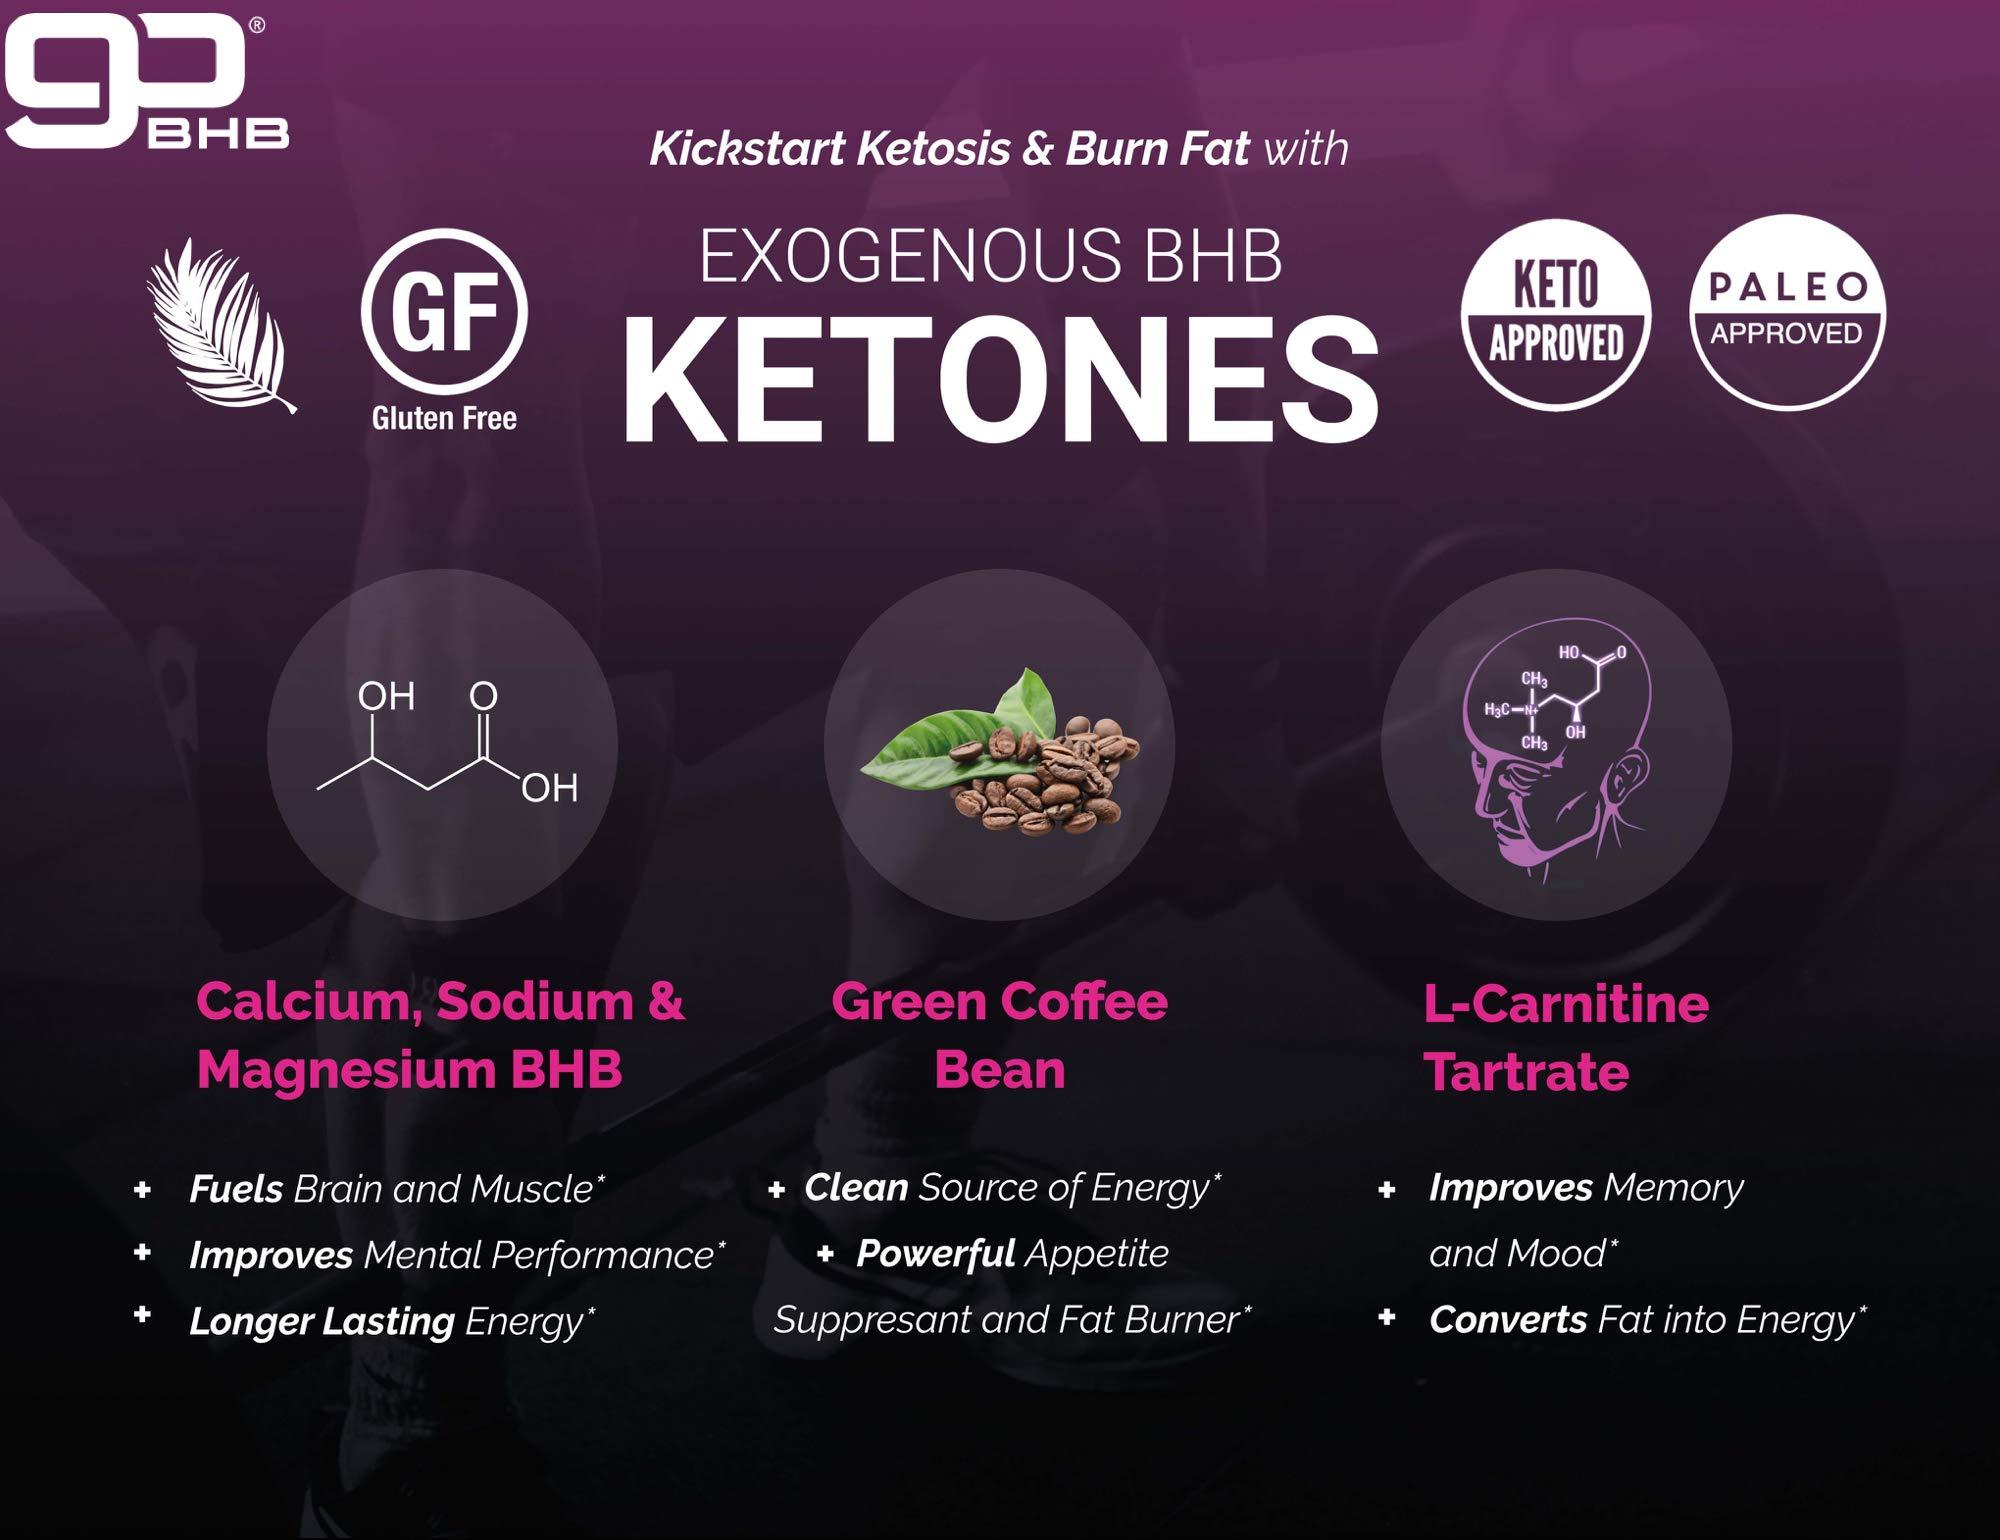 Keto BHB Exogenous Ketones Pills (2720mg | 120 Capsules) Keto Pills w. goBHB Salts, Natural Caffeine & L-Carnitine - Keto BHB Oil Capsules Beta Hydroxybutyrate for Weight Loss Keto Vitamins Keto Salts by Zeal Naturals (Image #4)